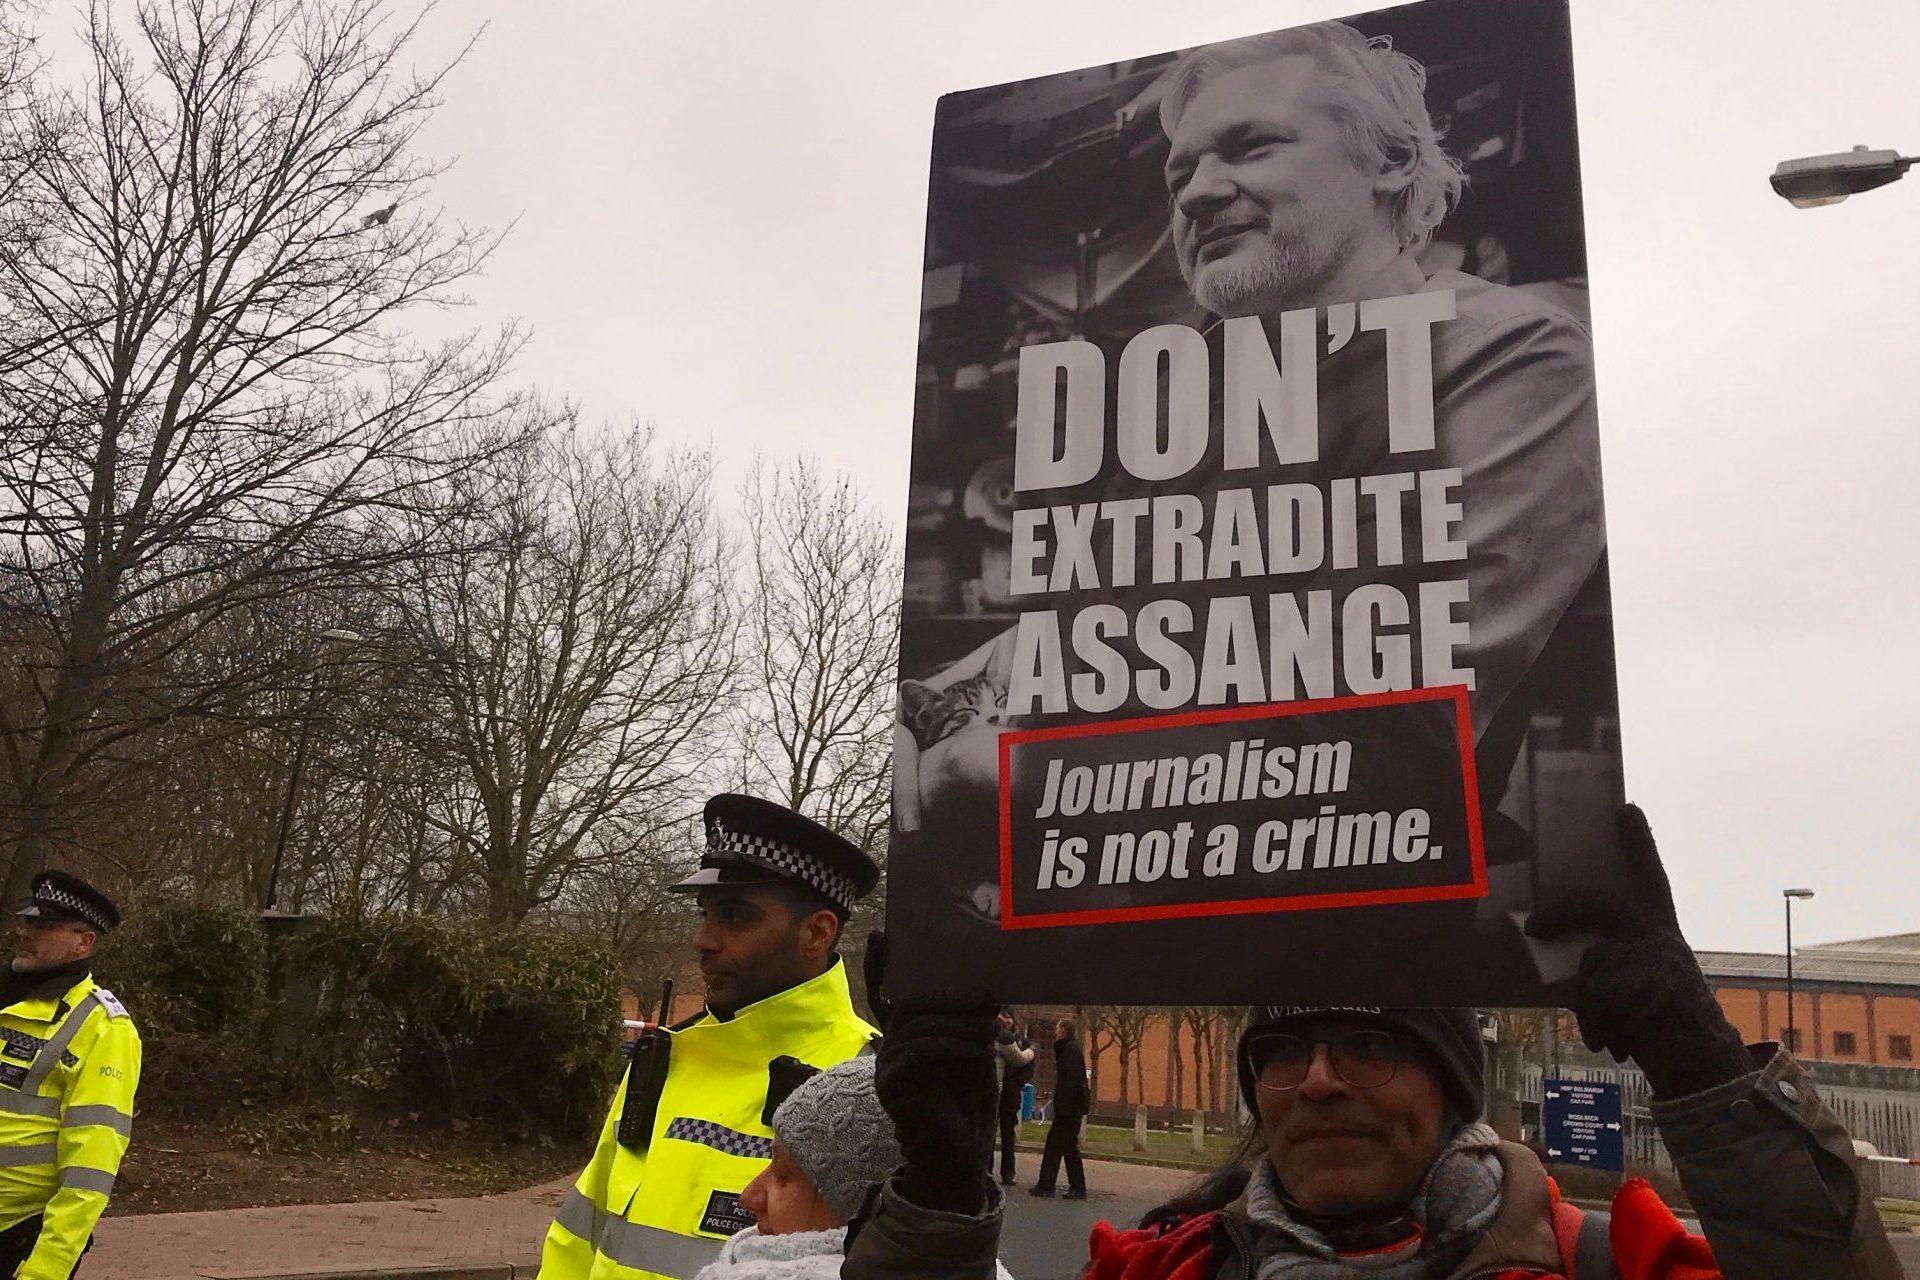 Assange supporter and police outside Belmarsh jail, London.